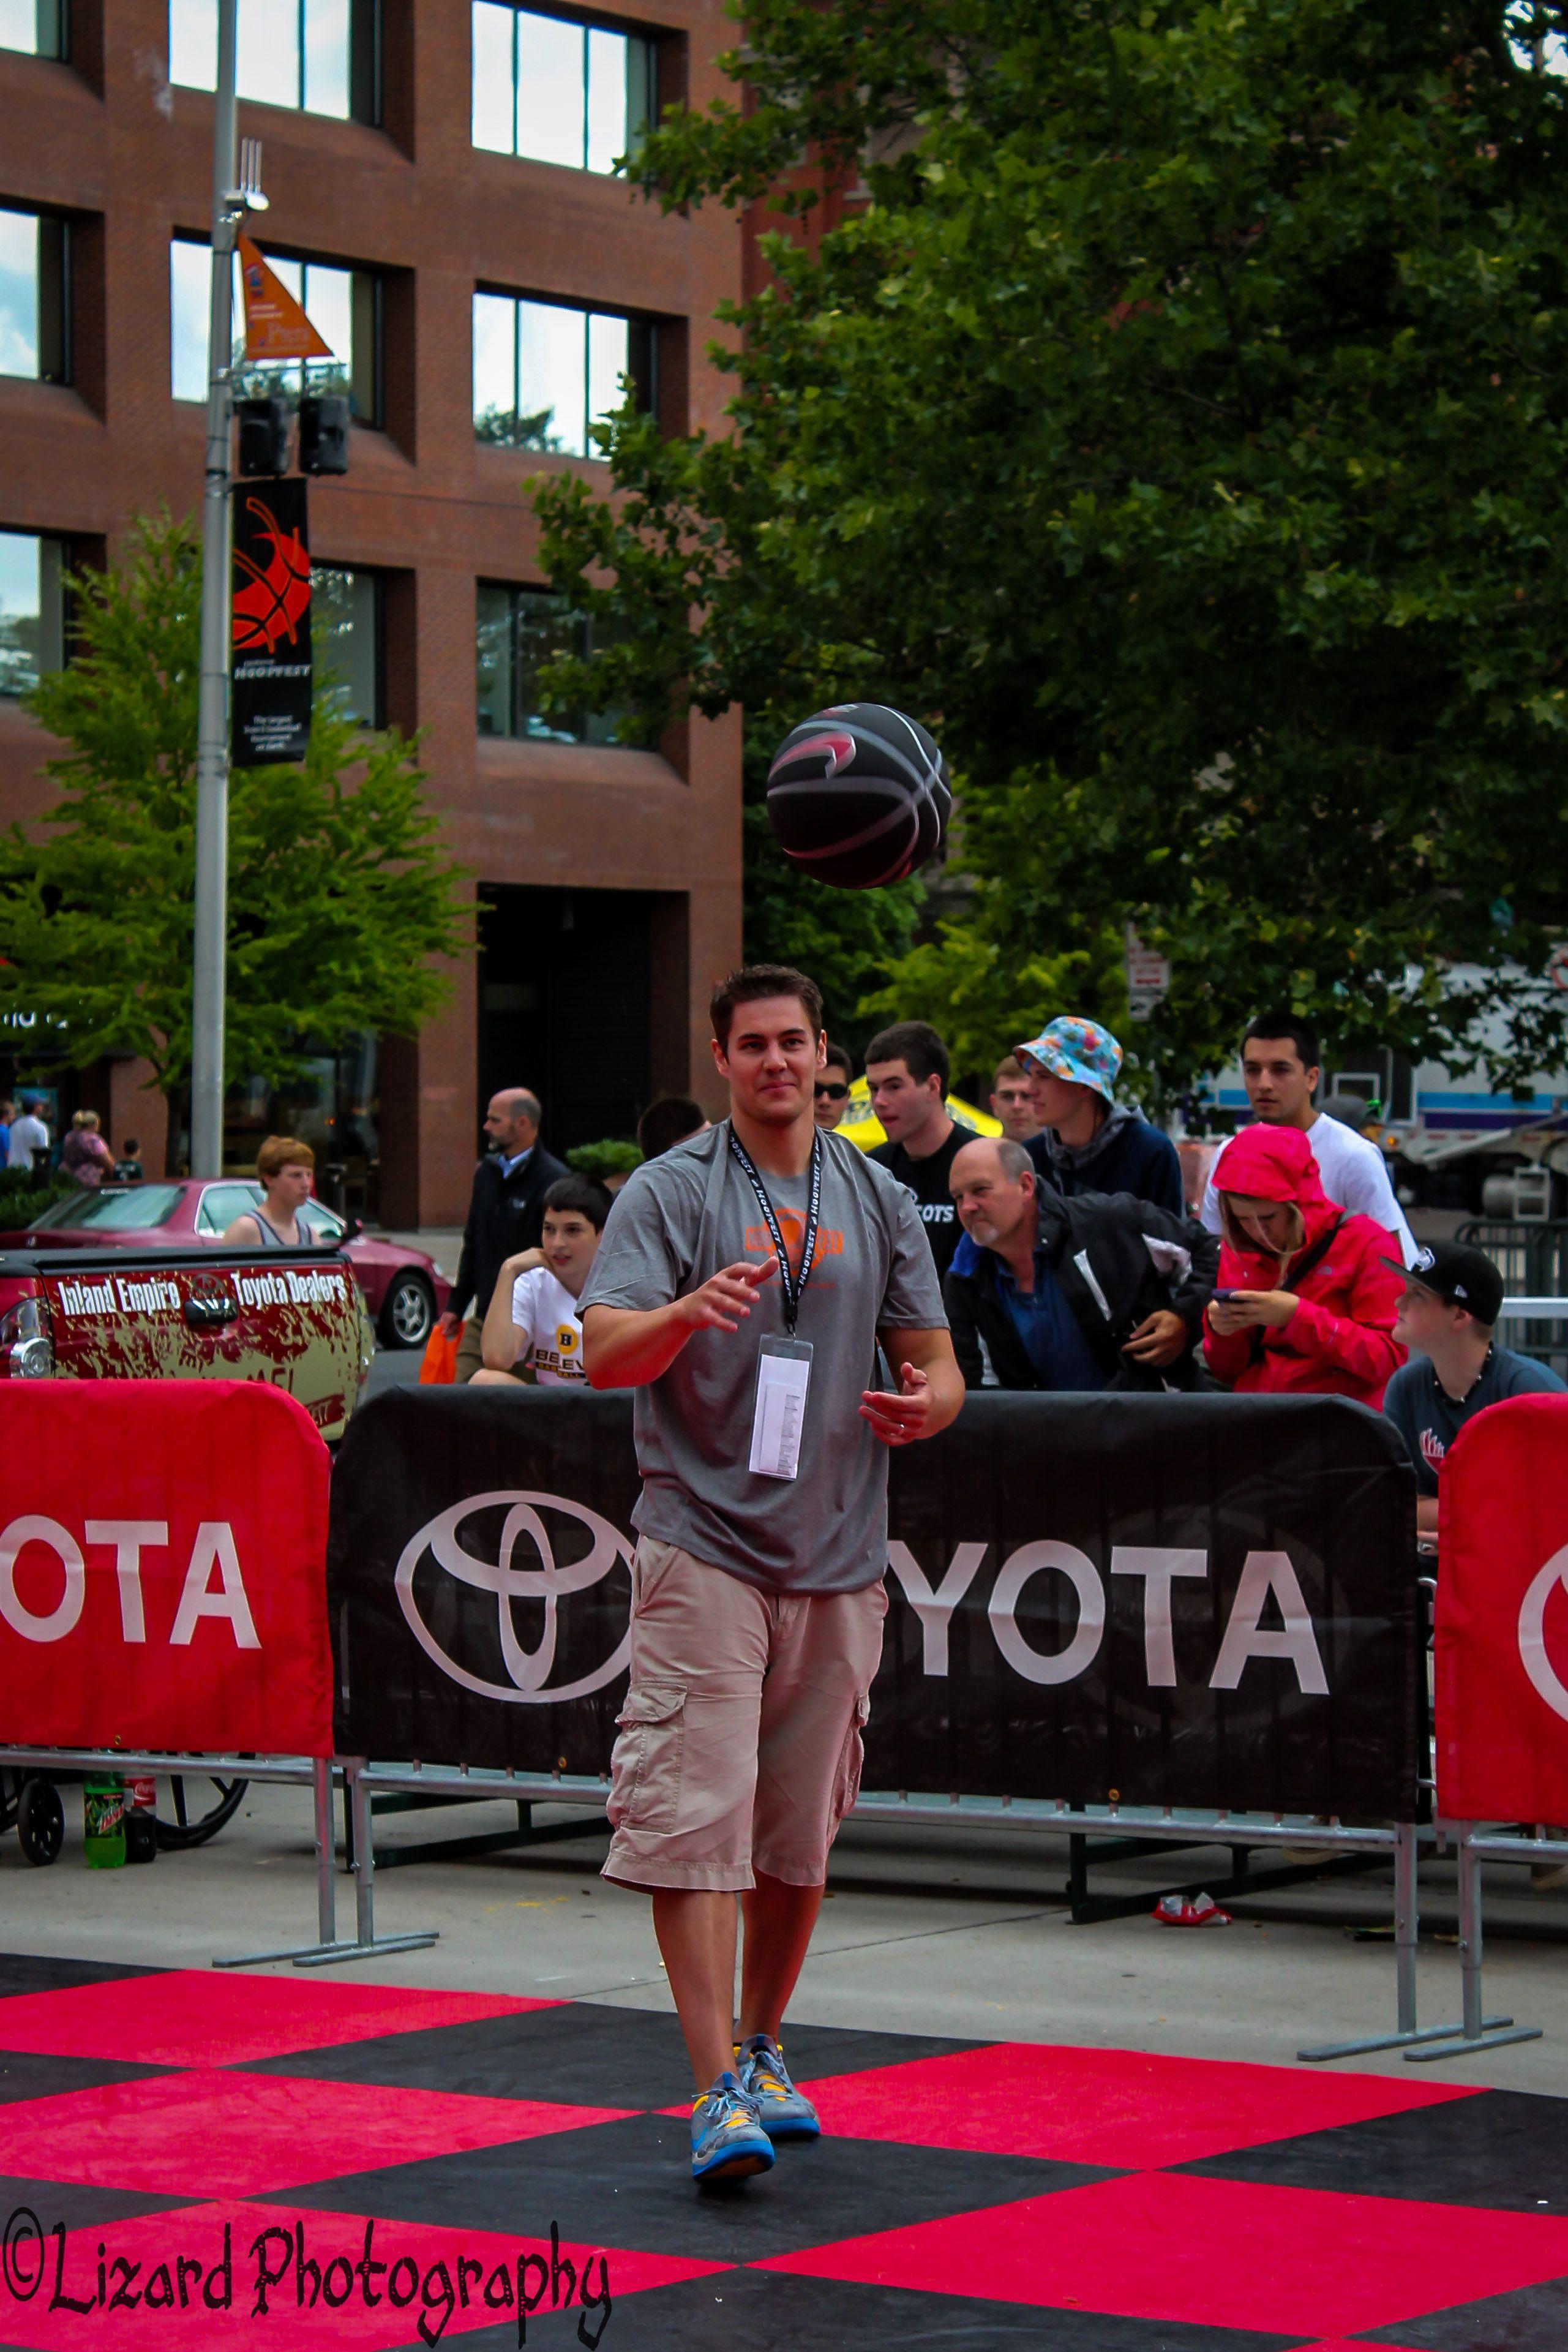 Toyota free throw challenge #hoopfest25 - Elizabeth McNally Photographer